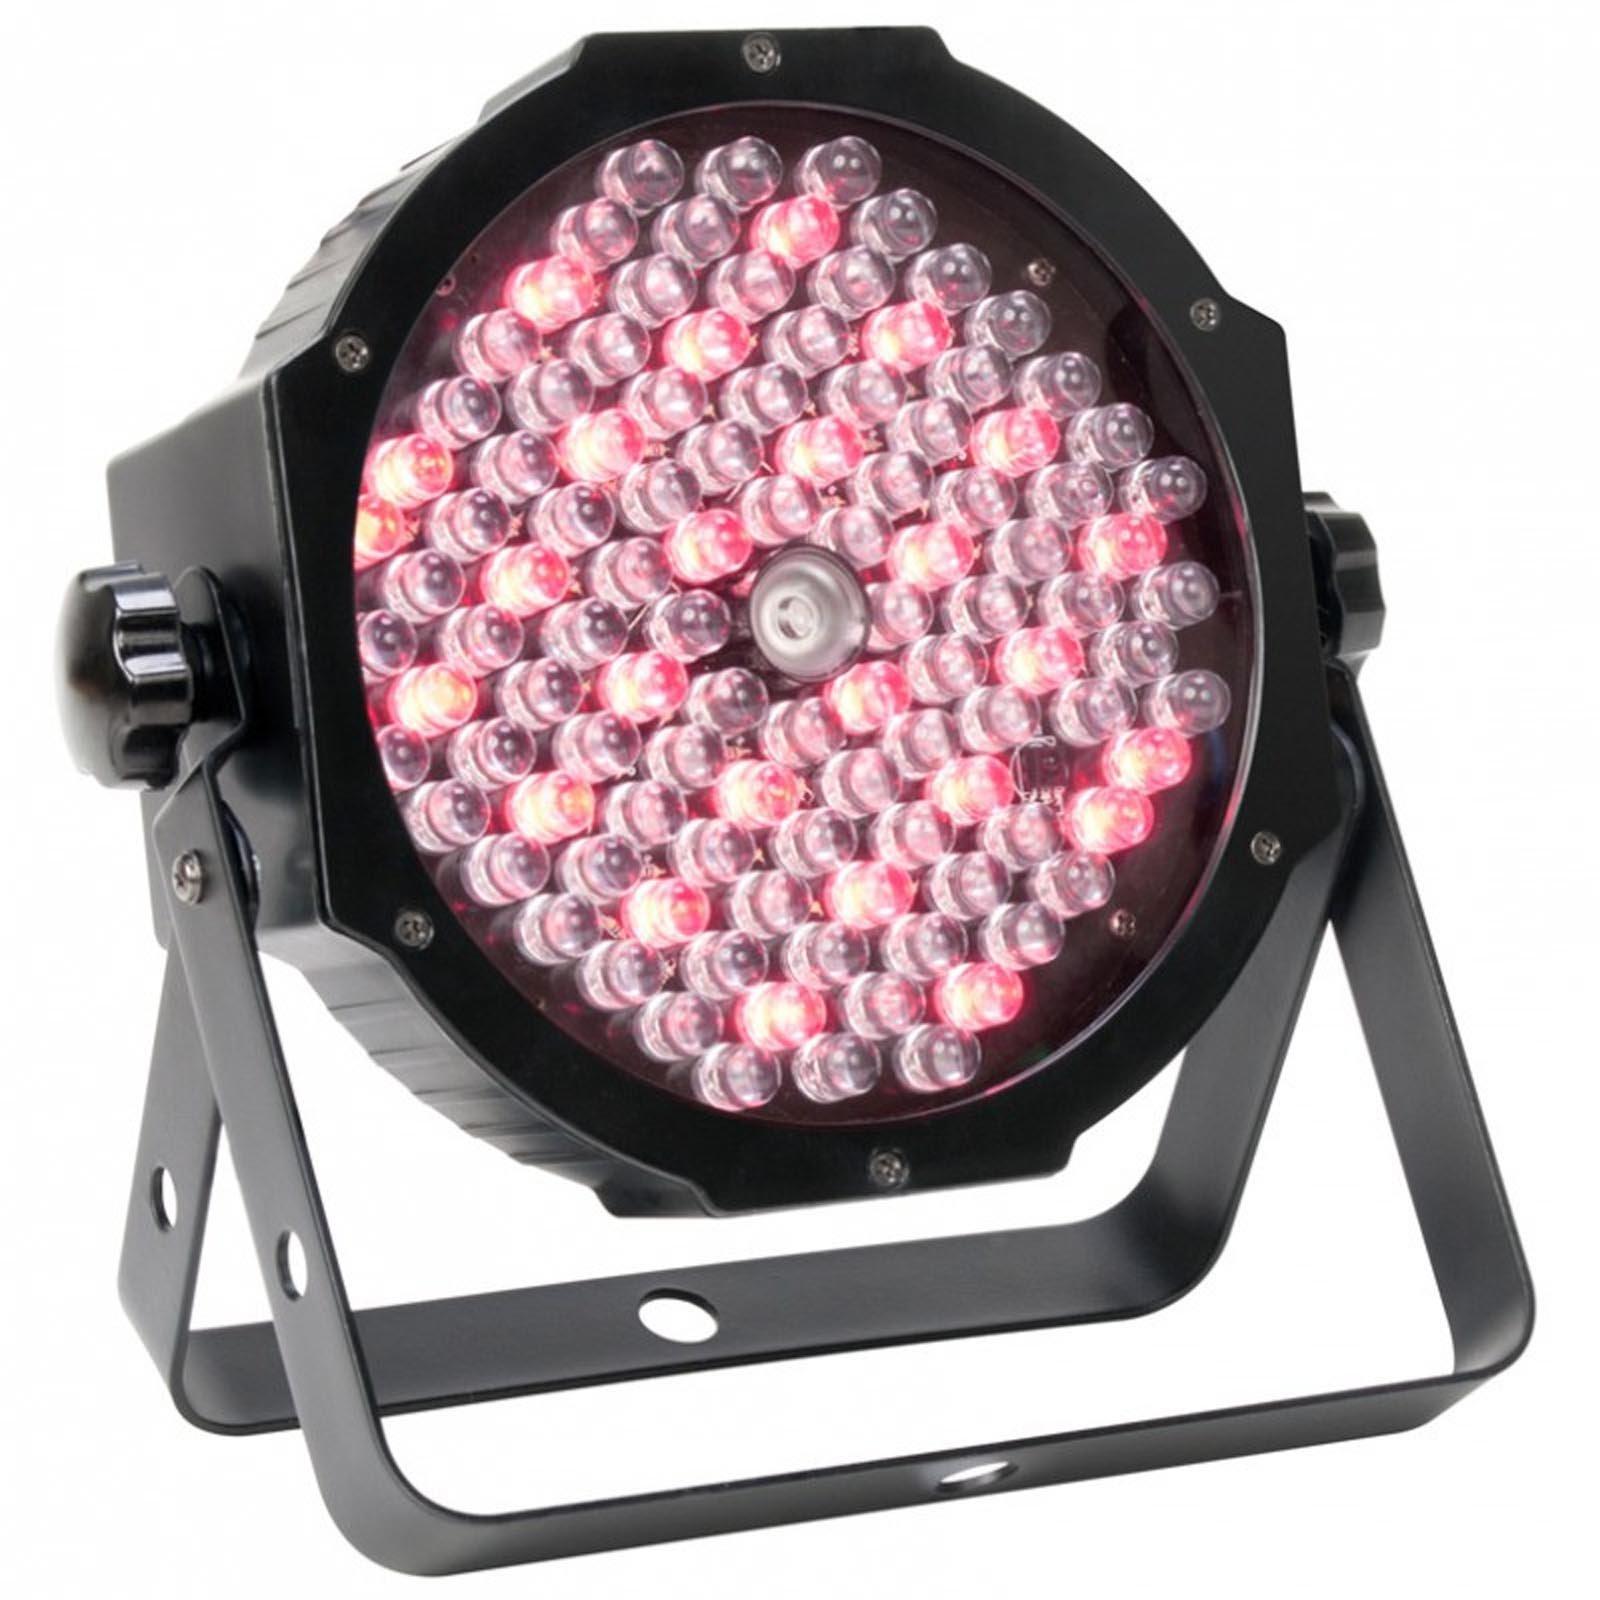 American DJ ADJ Mega Par Profile Plus LED RGB+UV Slim Par Can Wash Effect Light (6 Pack) by ADJ (Image #5)